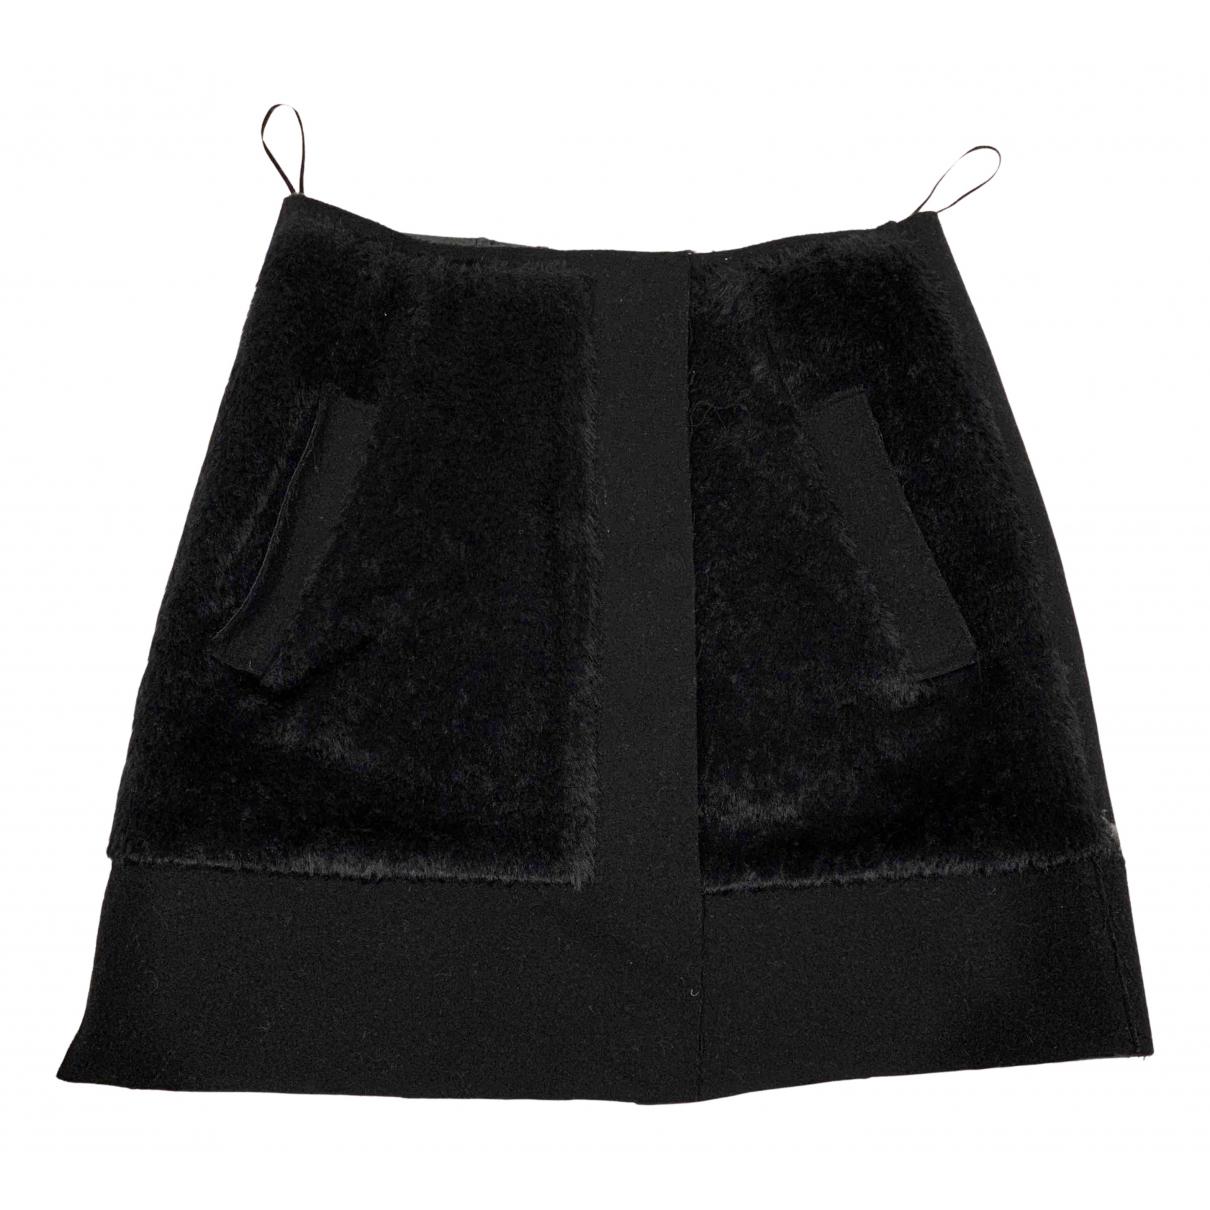 Balenciaga \N Black Wool skirt for Women 38 FR